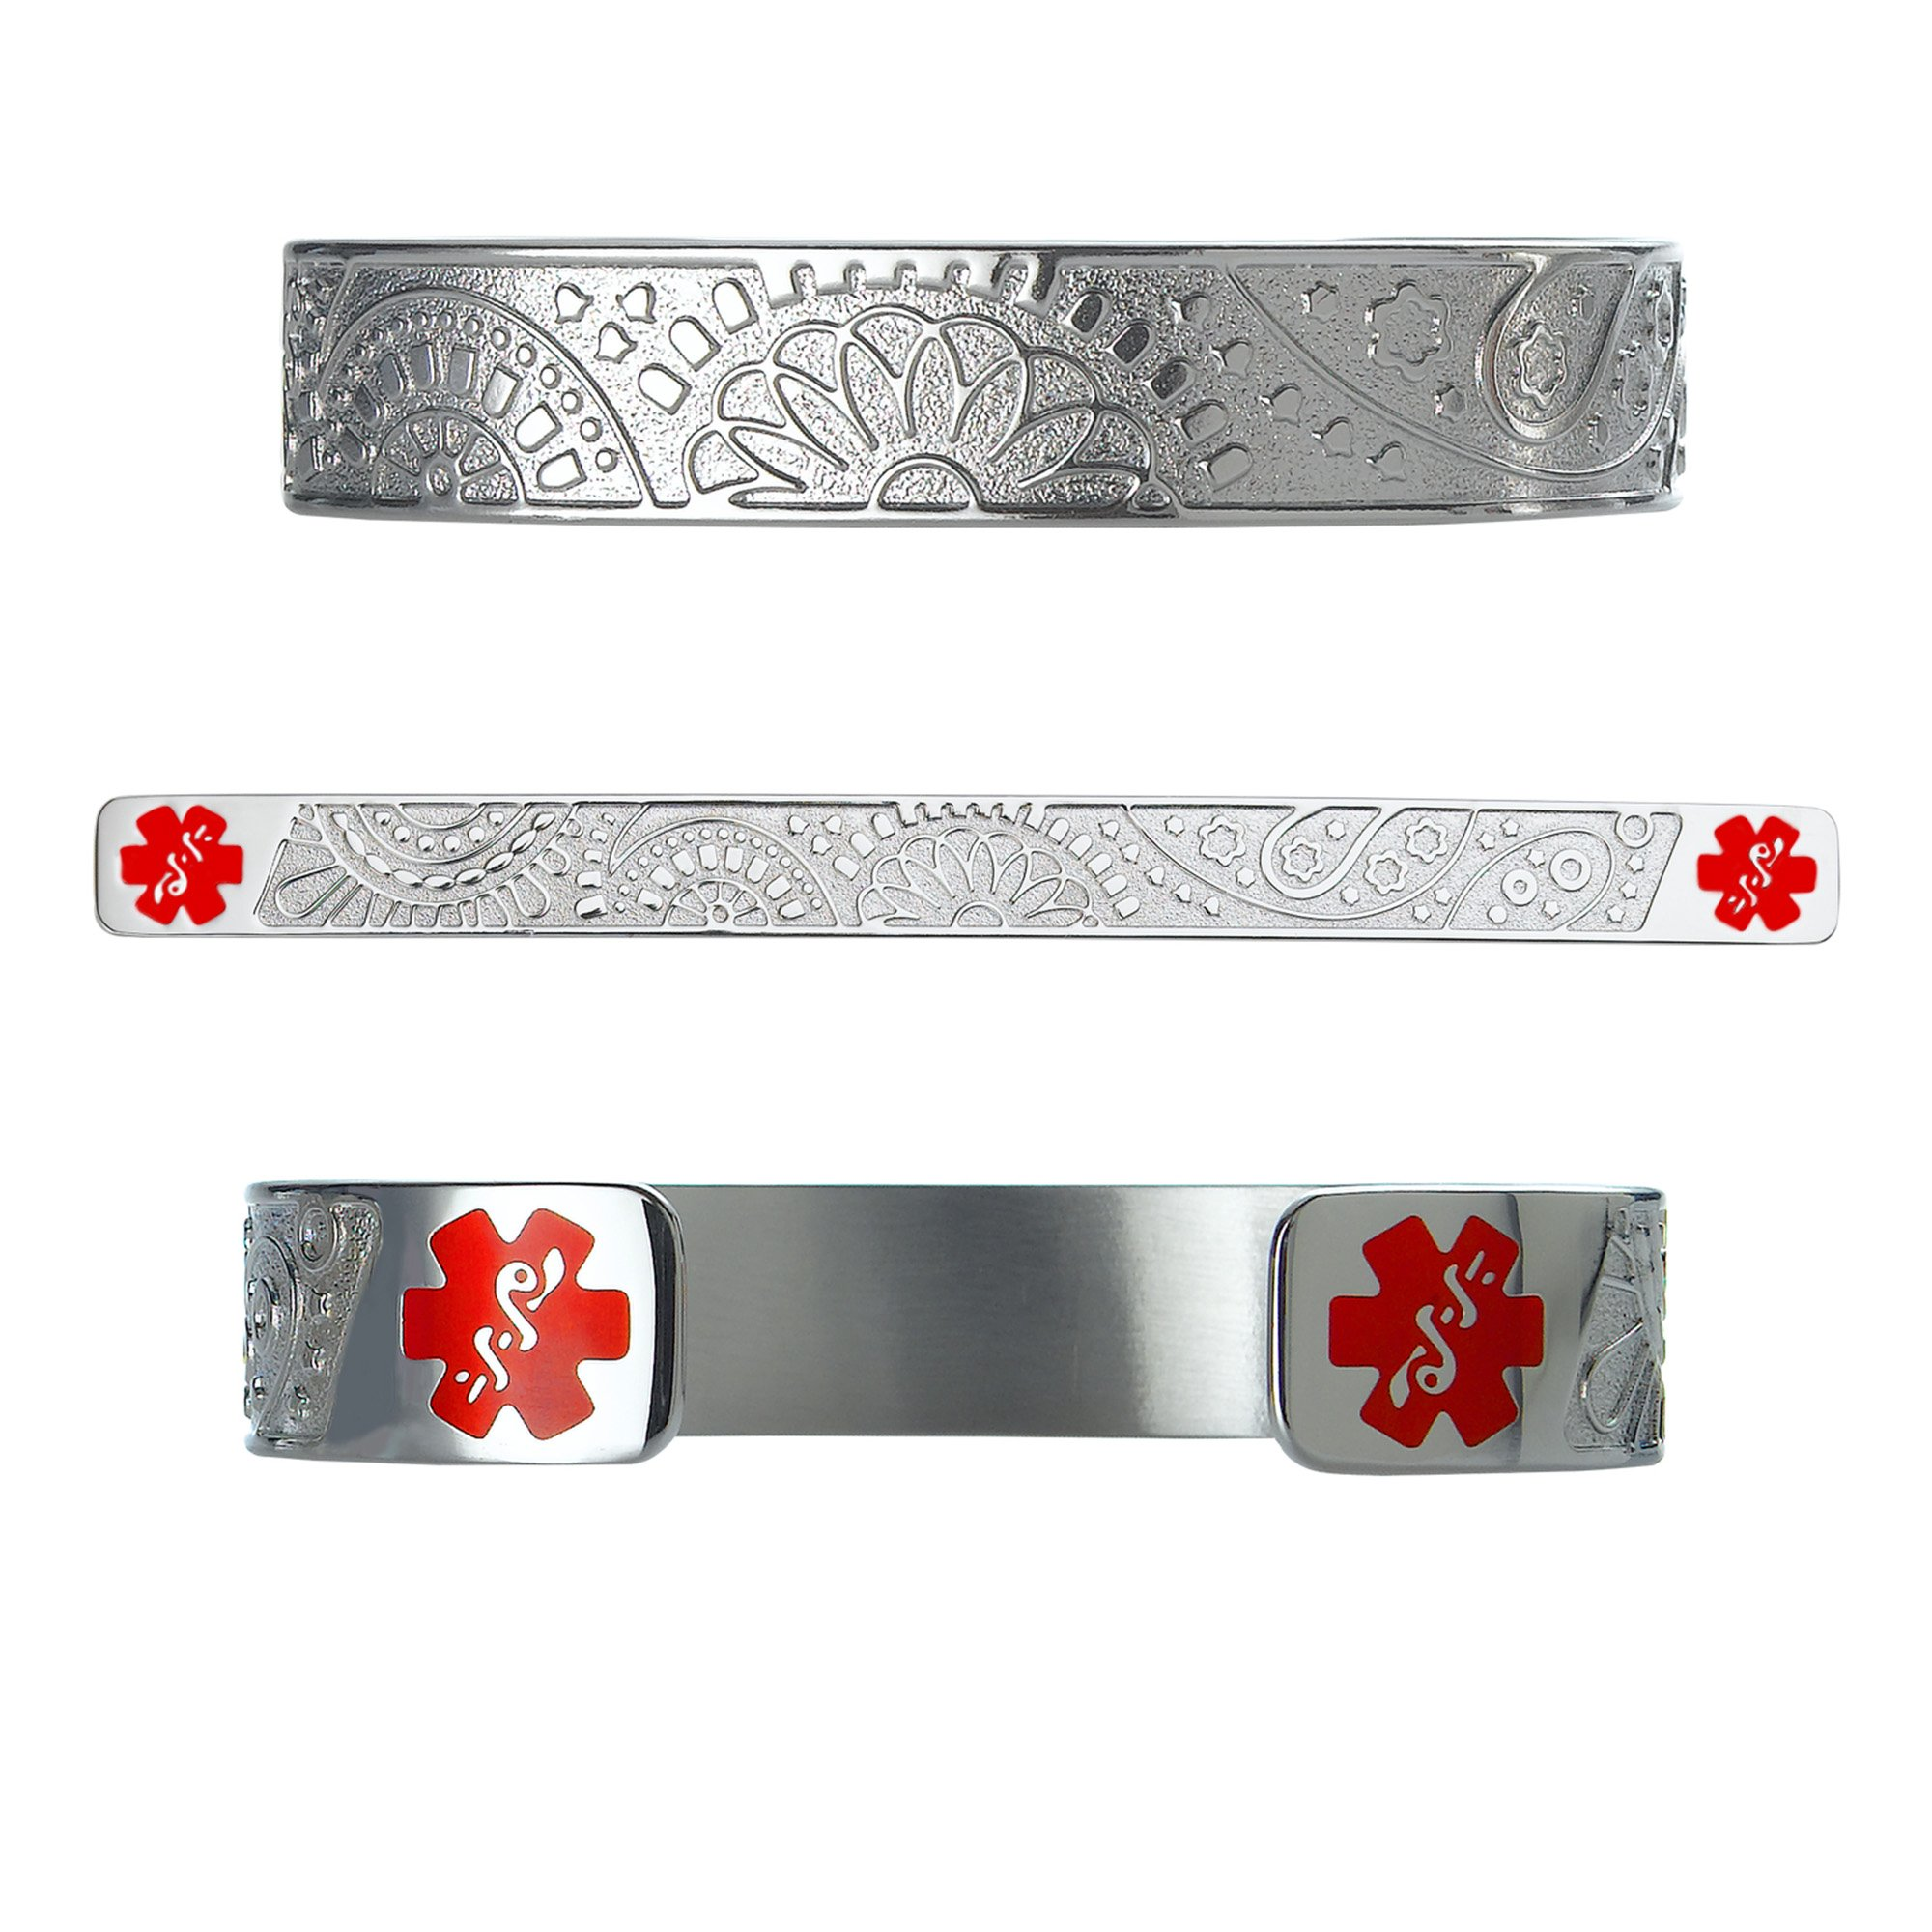 Divoti Custom Engraved Fancy Paisley 316L Medical Alert Bracelet -6'' Cuff (fits 6.5-8.0'') - Red